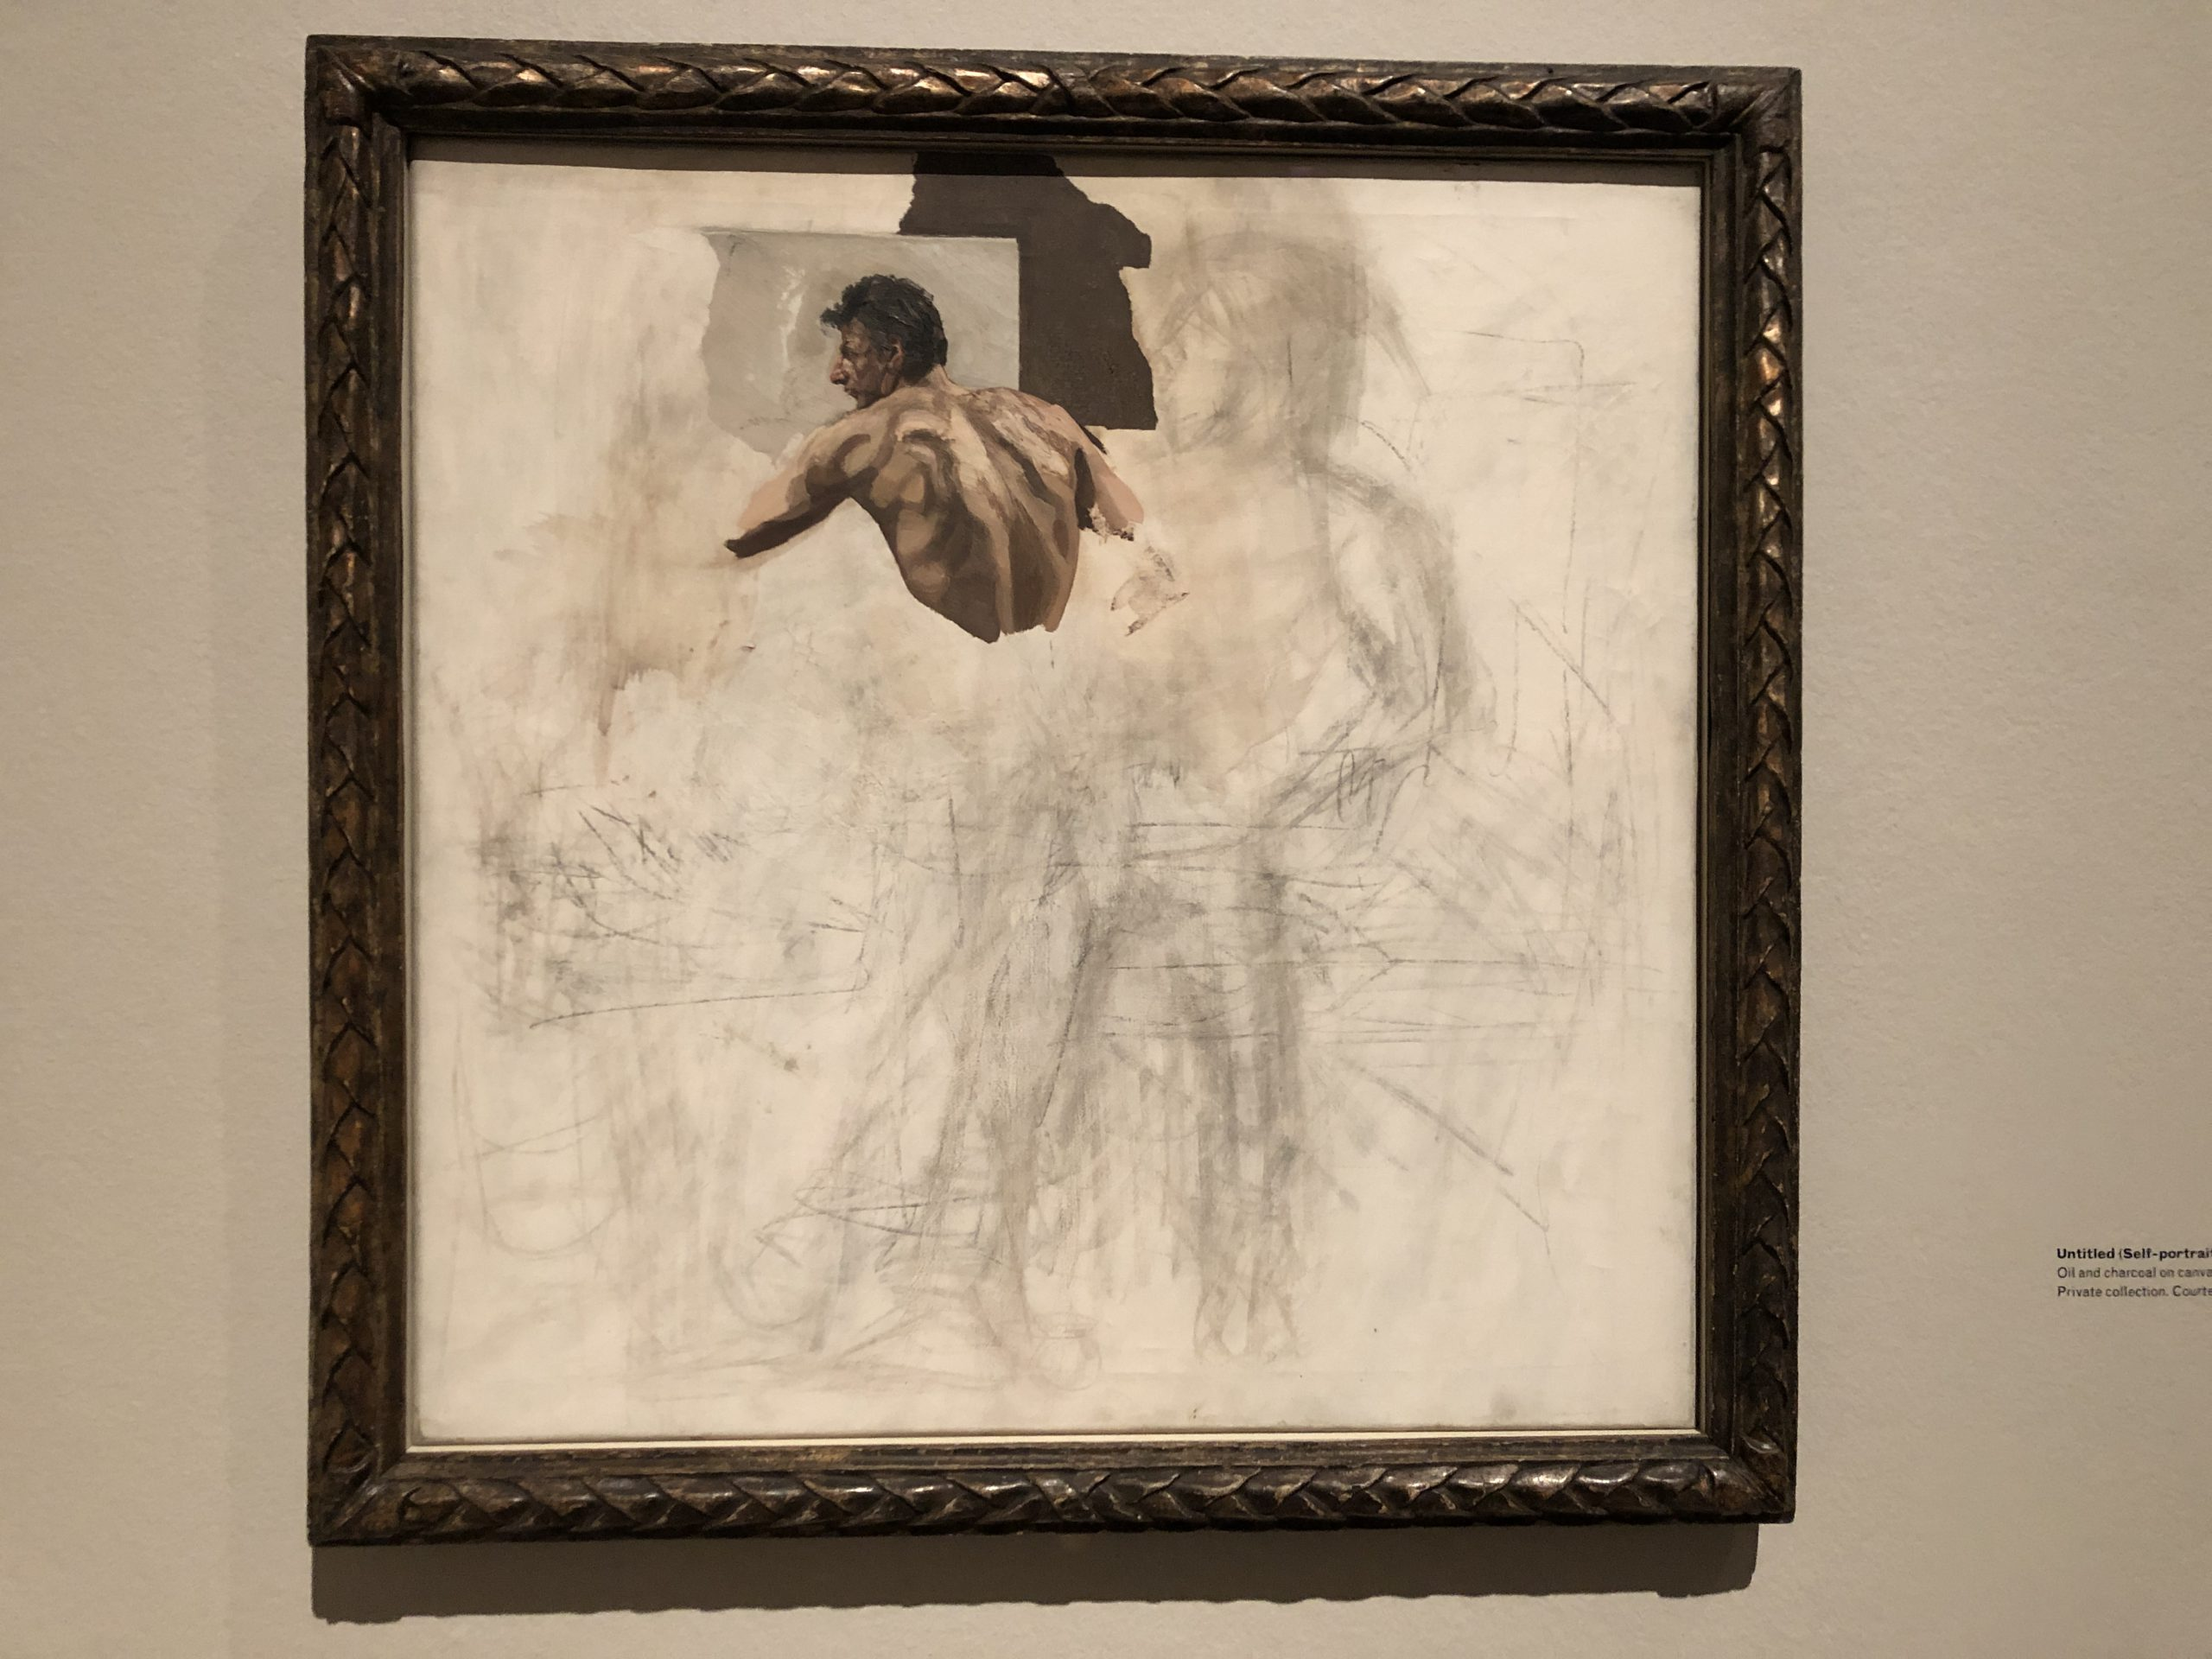 Image of artwork Untitled Self-portrait by artist Lucian Freud